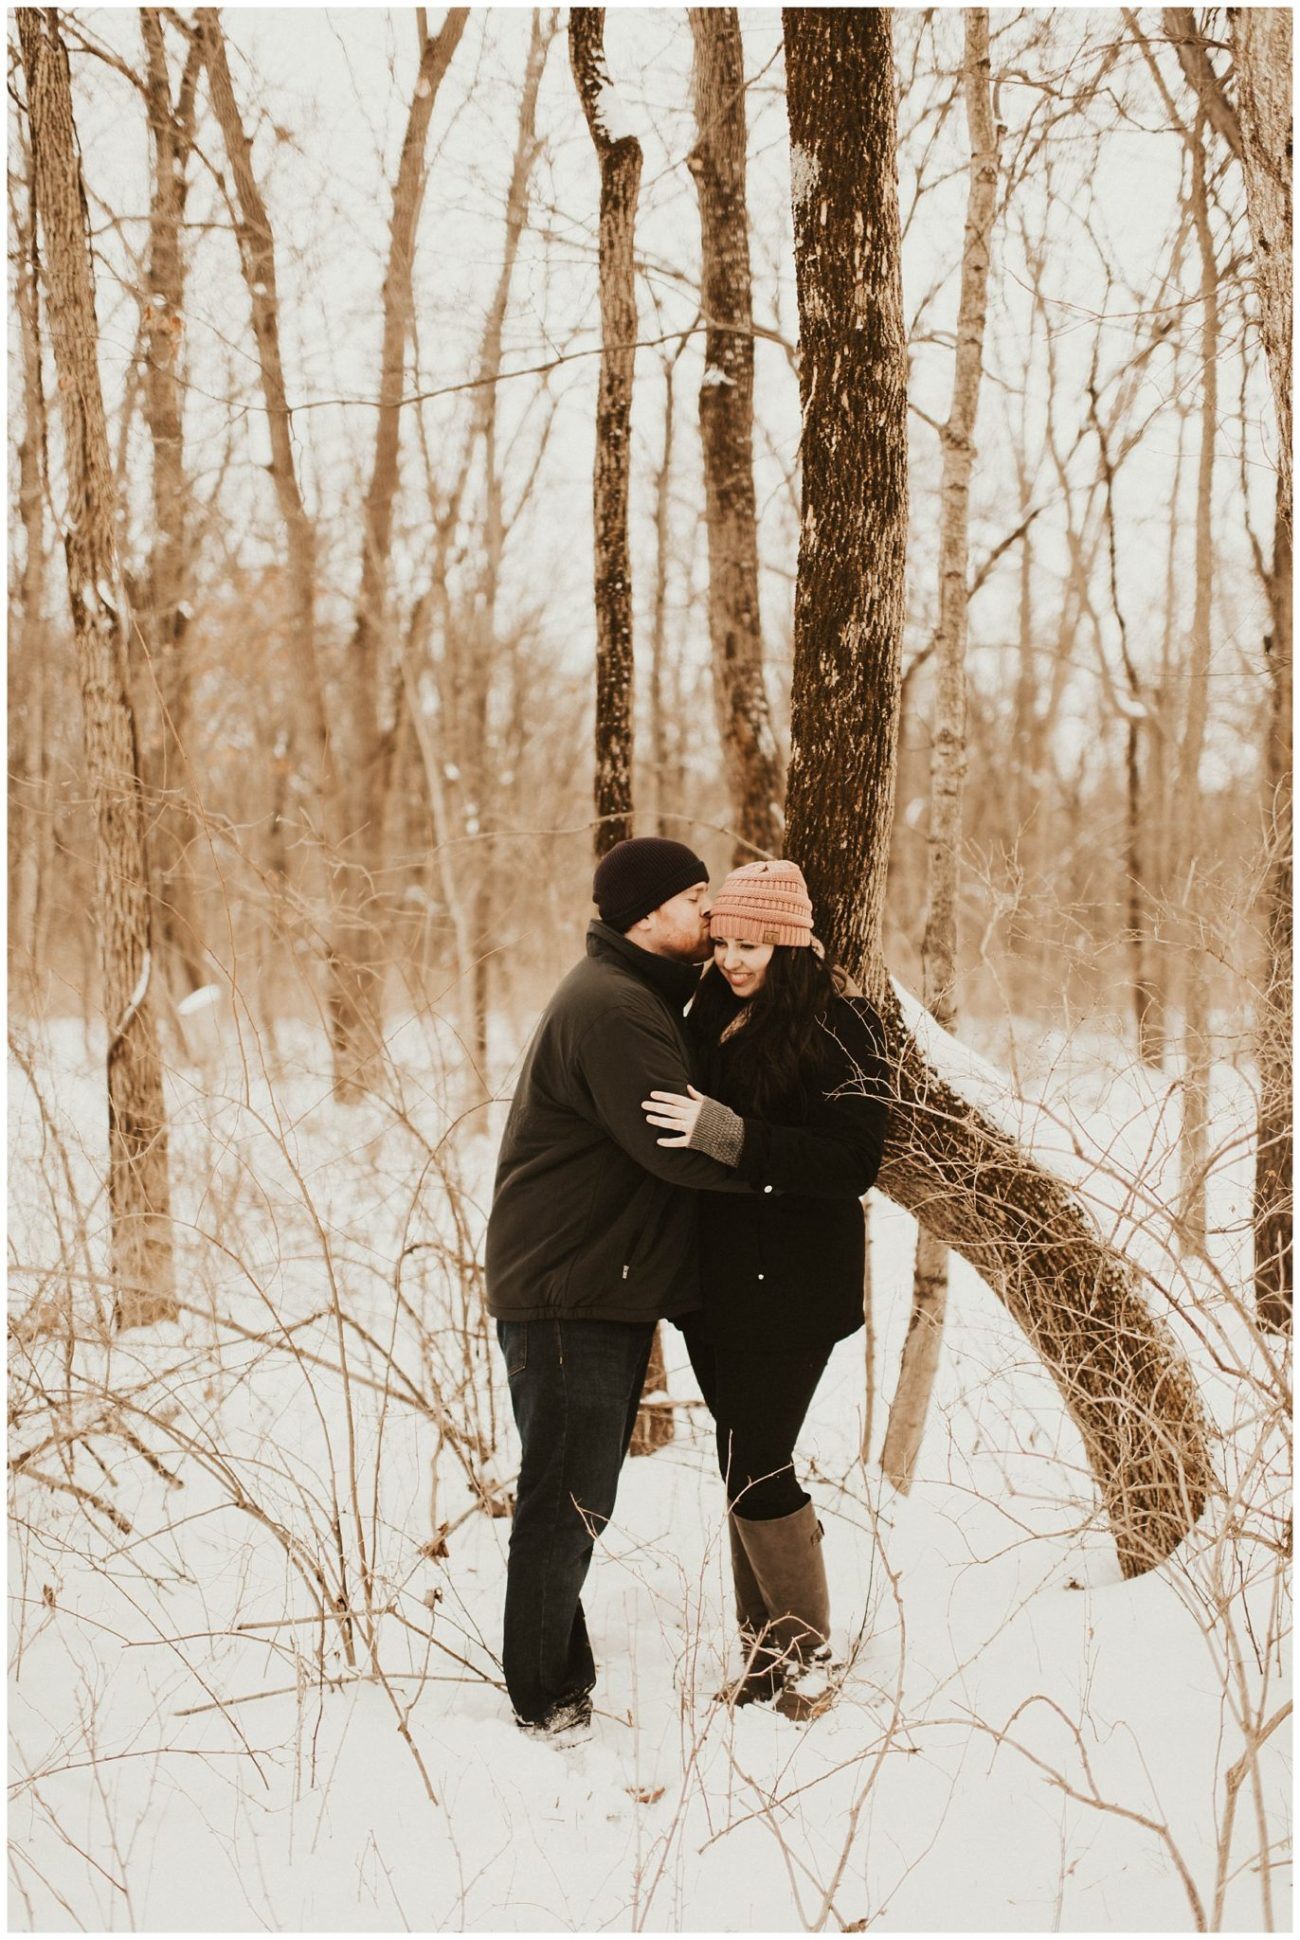 486cb09bd67607 Ben + Lainee // Winter Engagements - Lauren F.otography